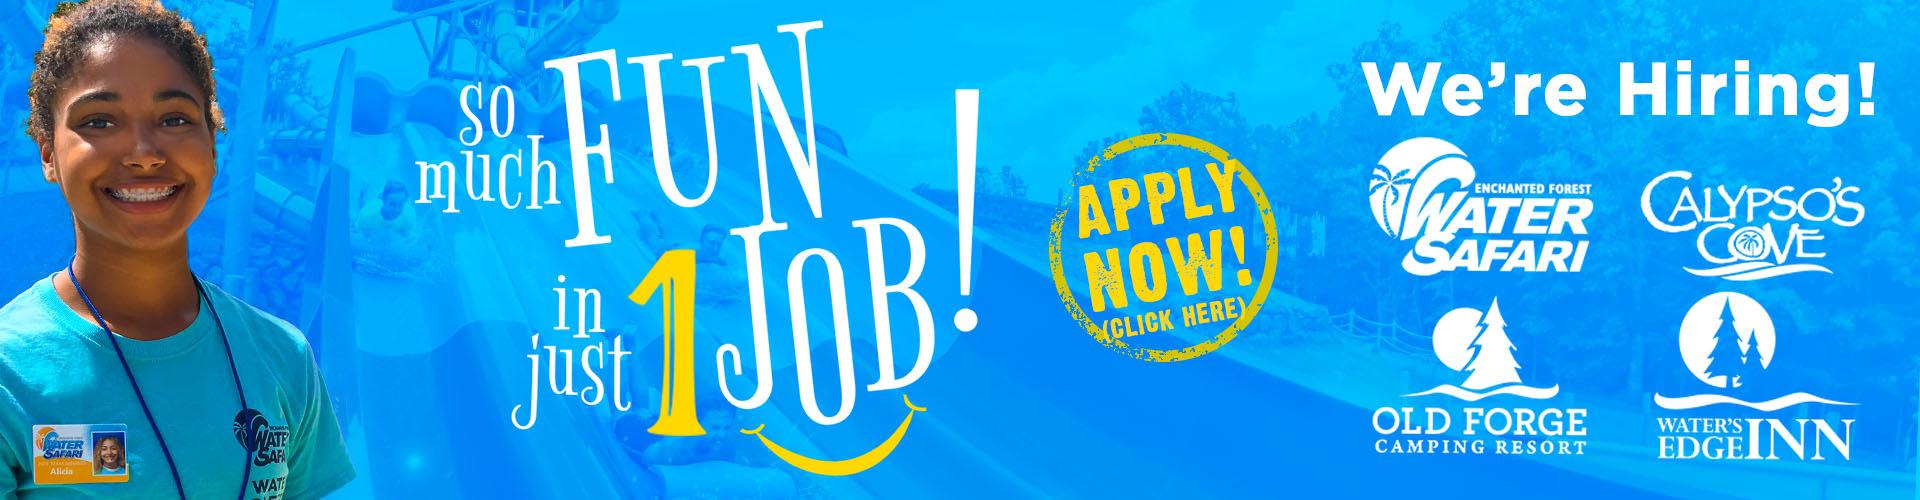 Water Safari Resort Hiring Summer 2021 - Apply Now!